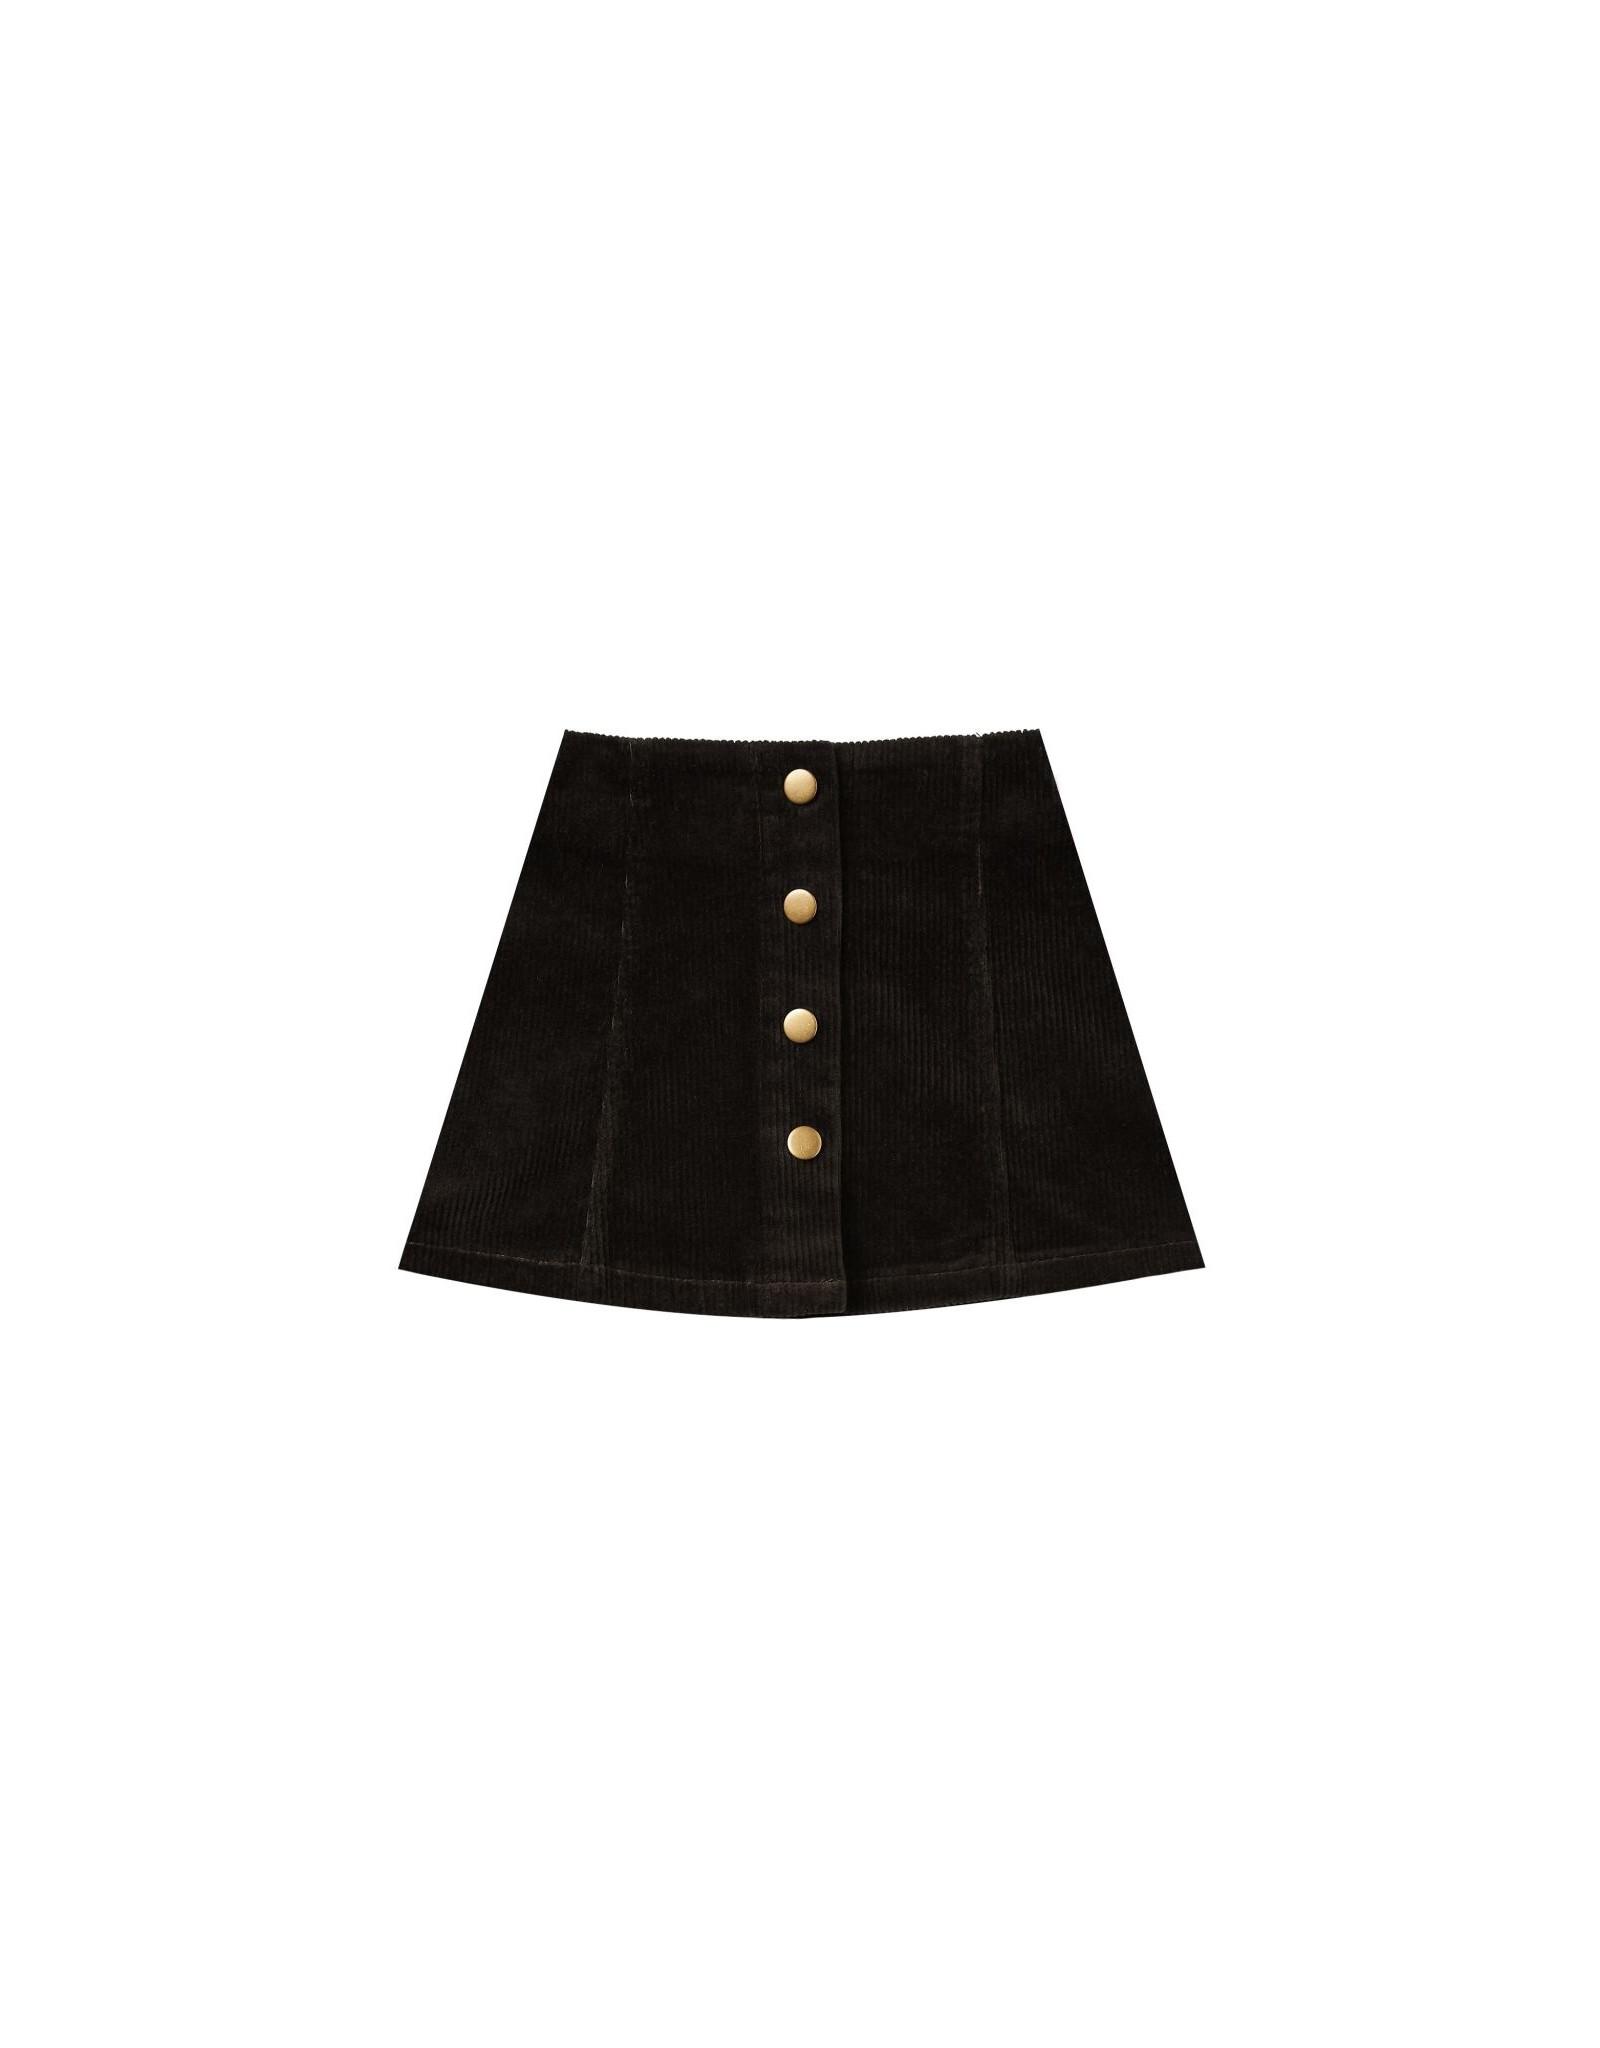 Rylee and Cru corduroy mini skirt- black